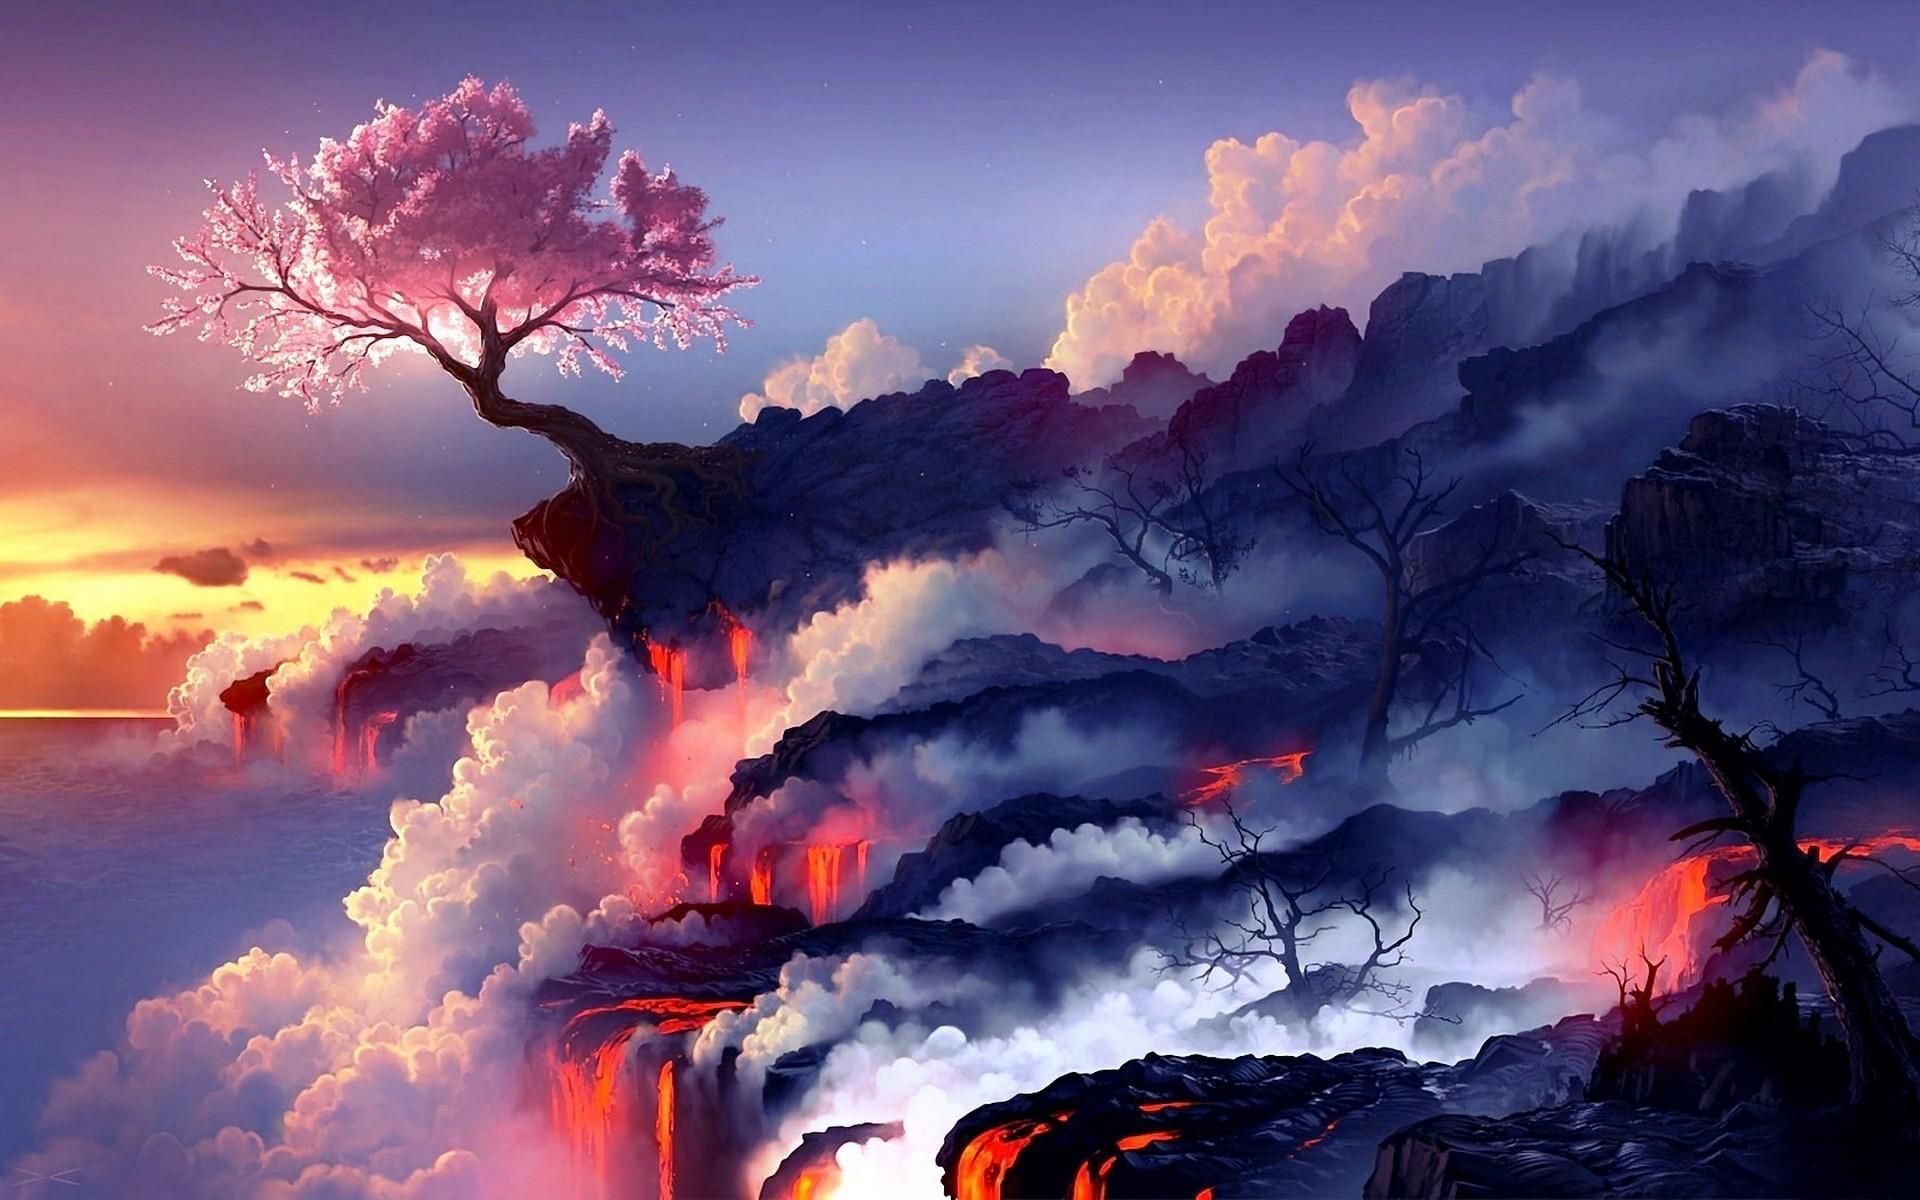 Cherry Blossom Tree HD Wallpaper Wallpaper Photoshop | HD Wallpapers |  Pinterest | Hd wallpaper and Wallpaper